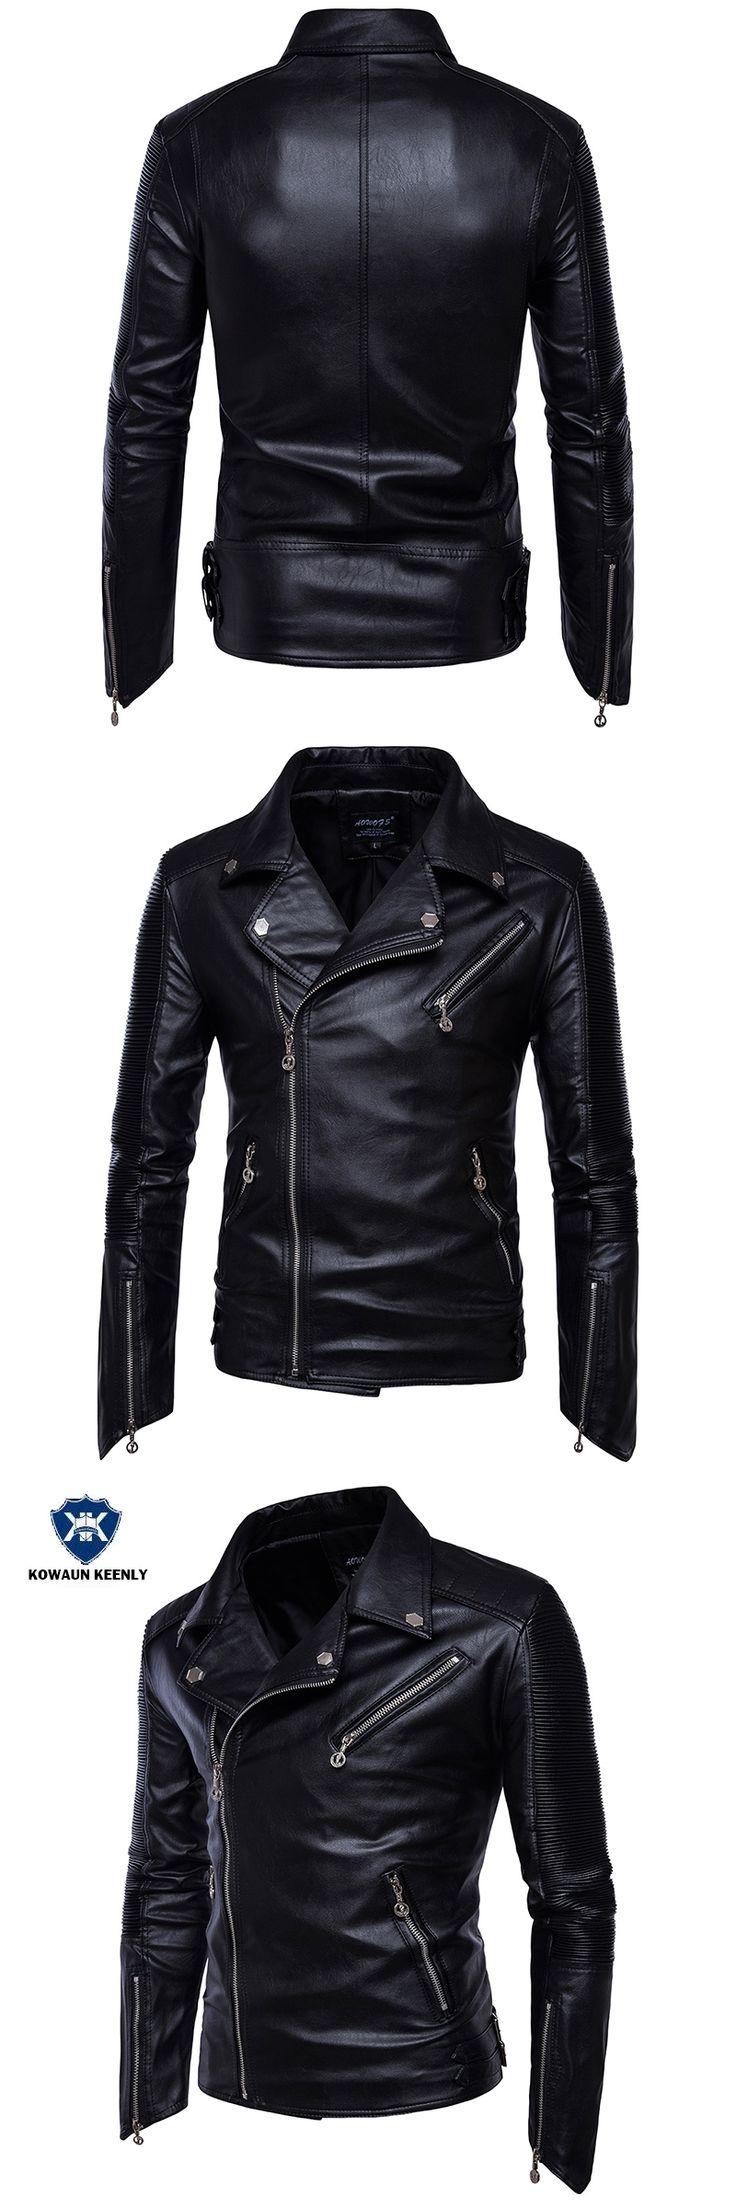 Men's Black Leather Jacket Biker PU Leather Jackets Punk Motorcycle Faux Leather Coat Plus Size 5XL Leather Blazer Overcoats